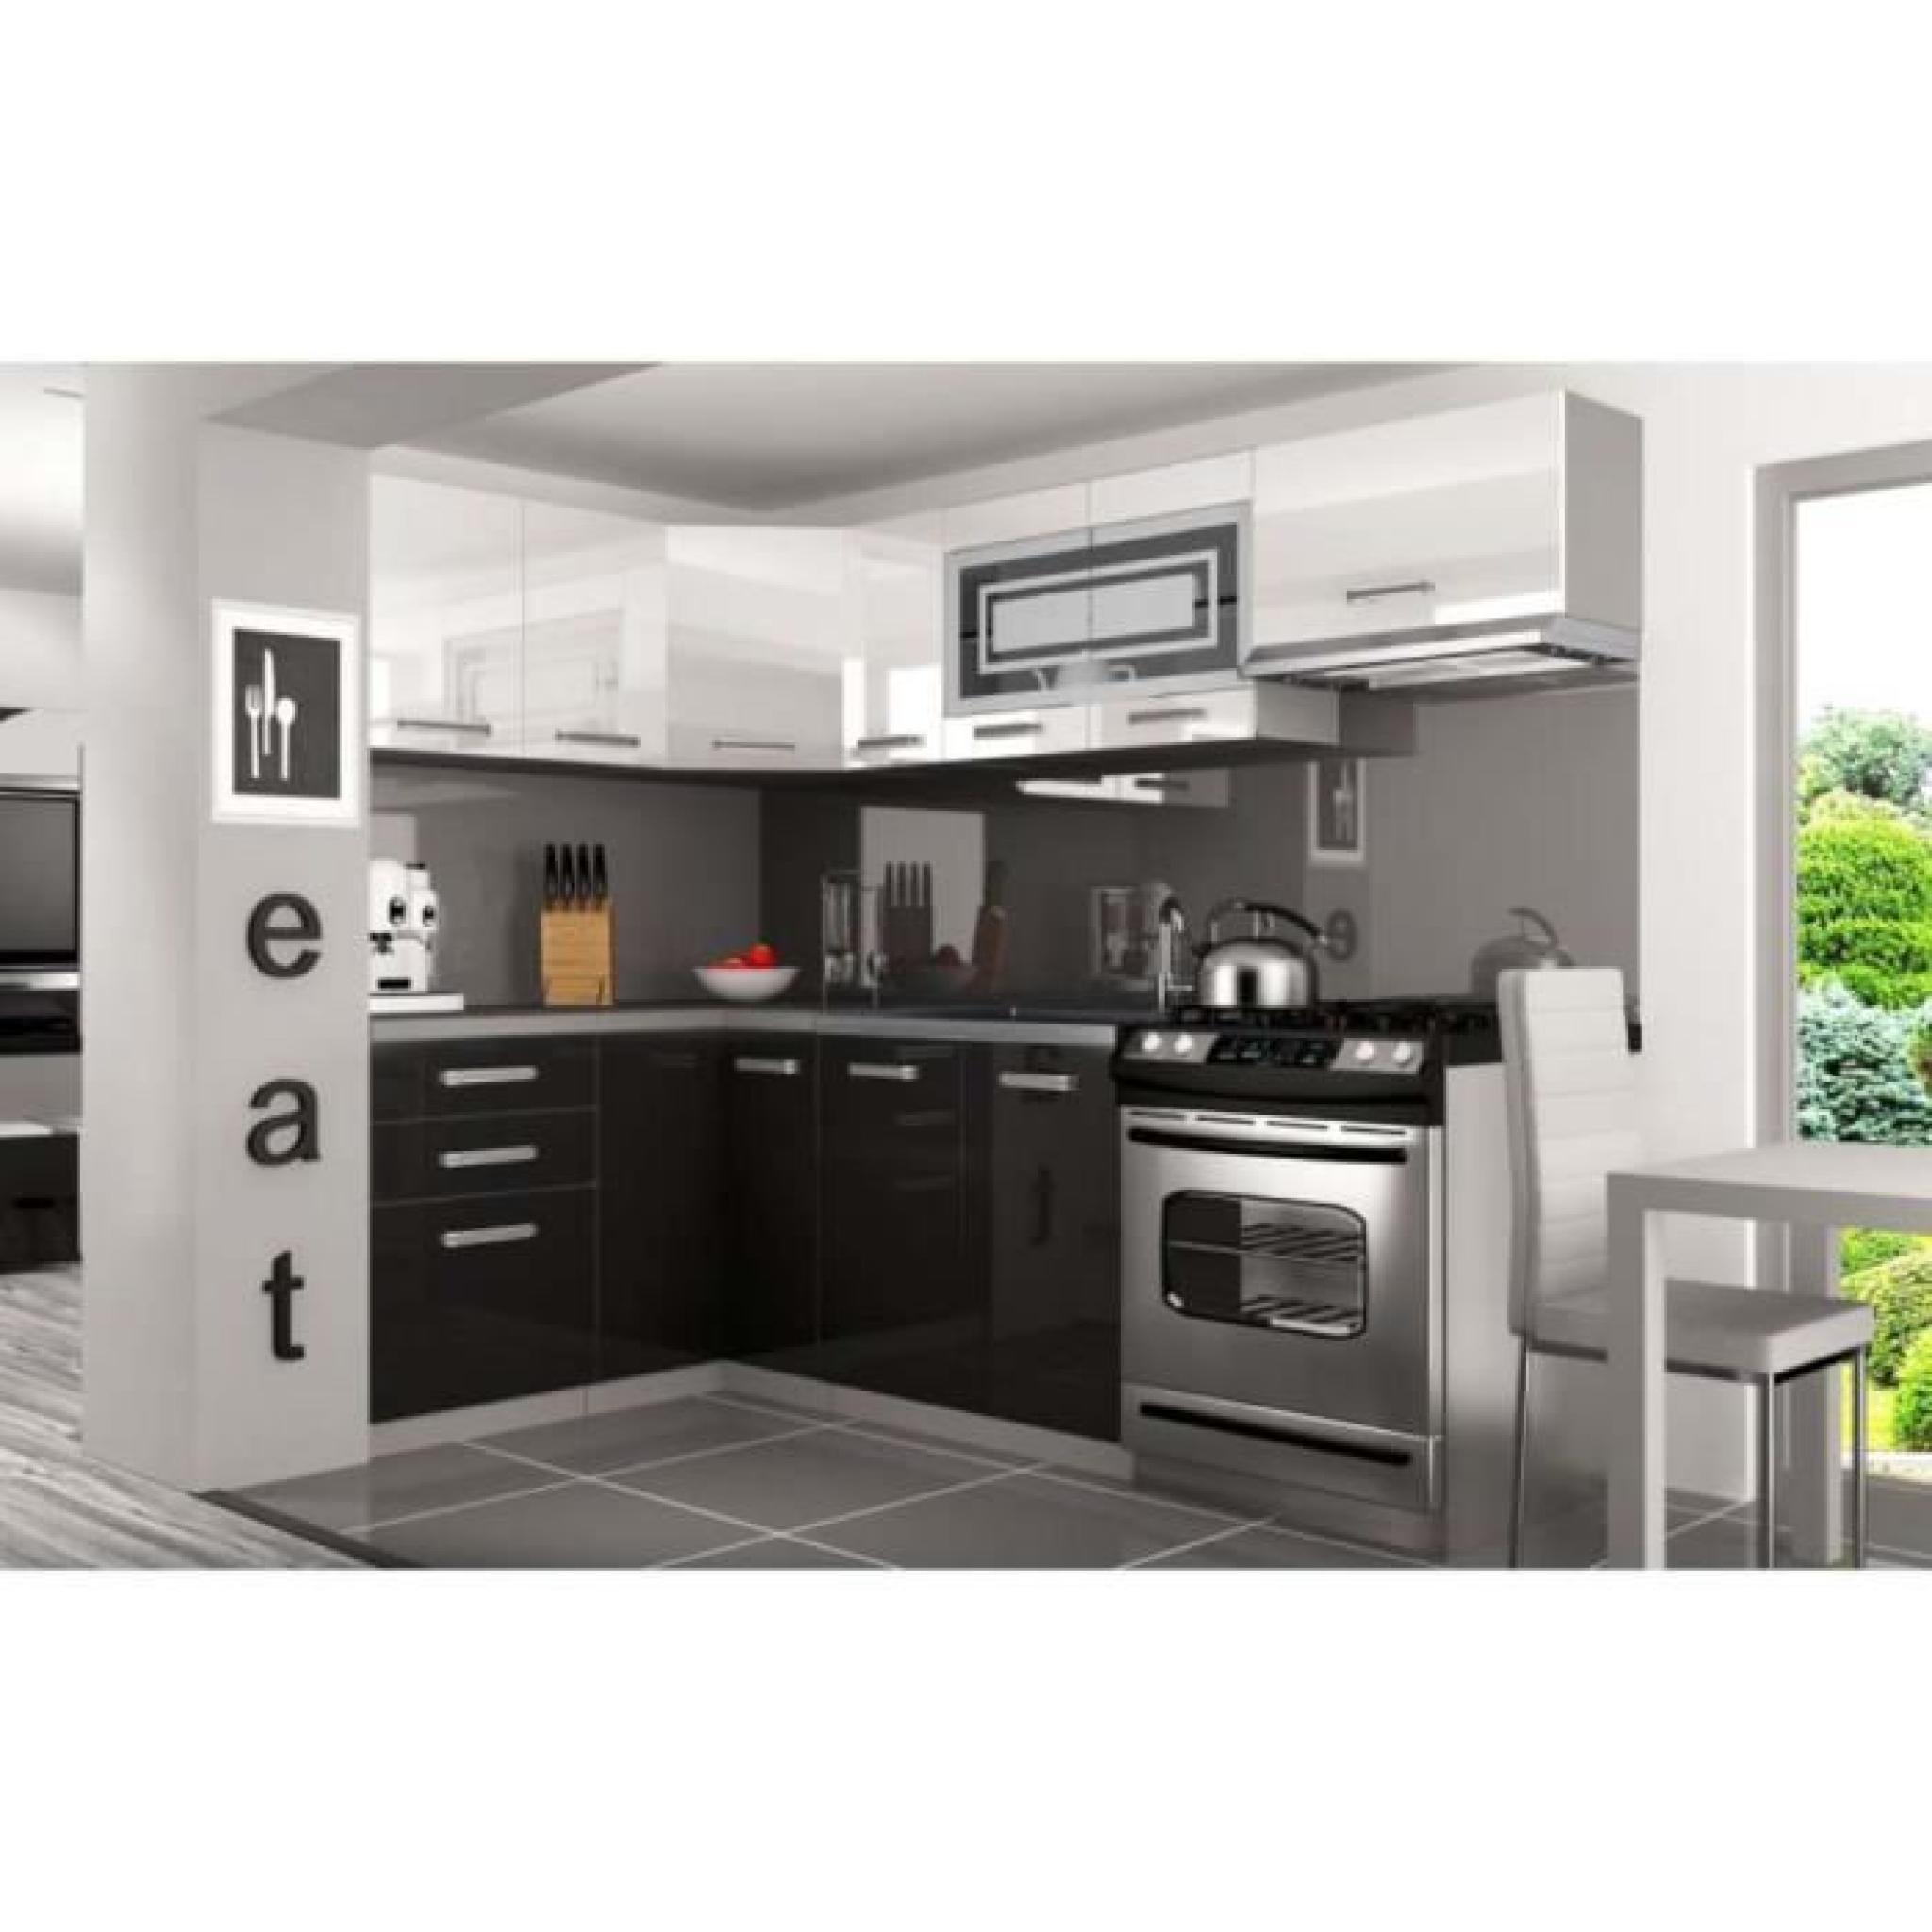 justhome lidja p pro l cuisine quip e compl te 130x230 cm. Black Bedroom Furniture Sets. Home Design Ideas